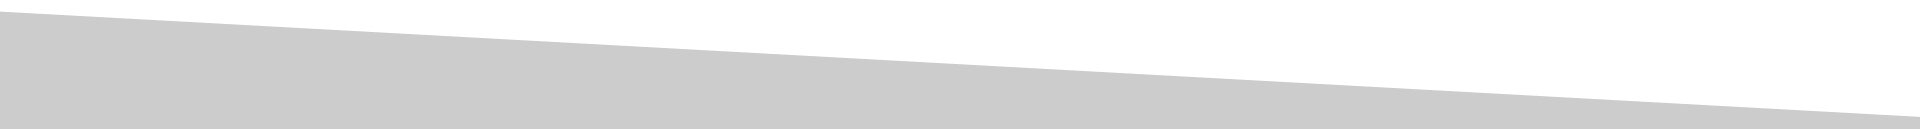 detalhe-layout-servicos-base-2